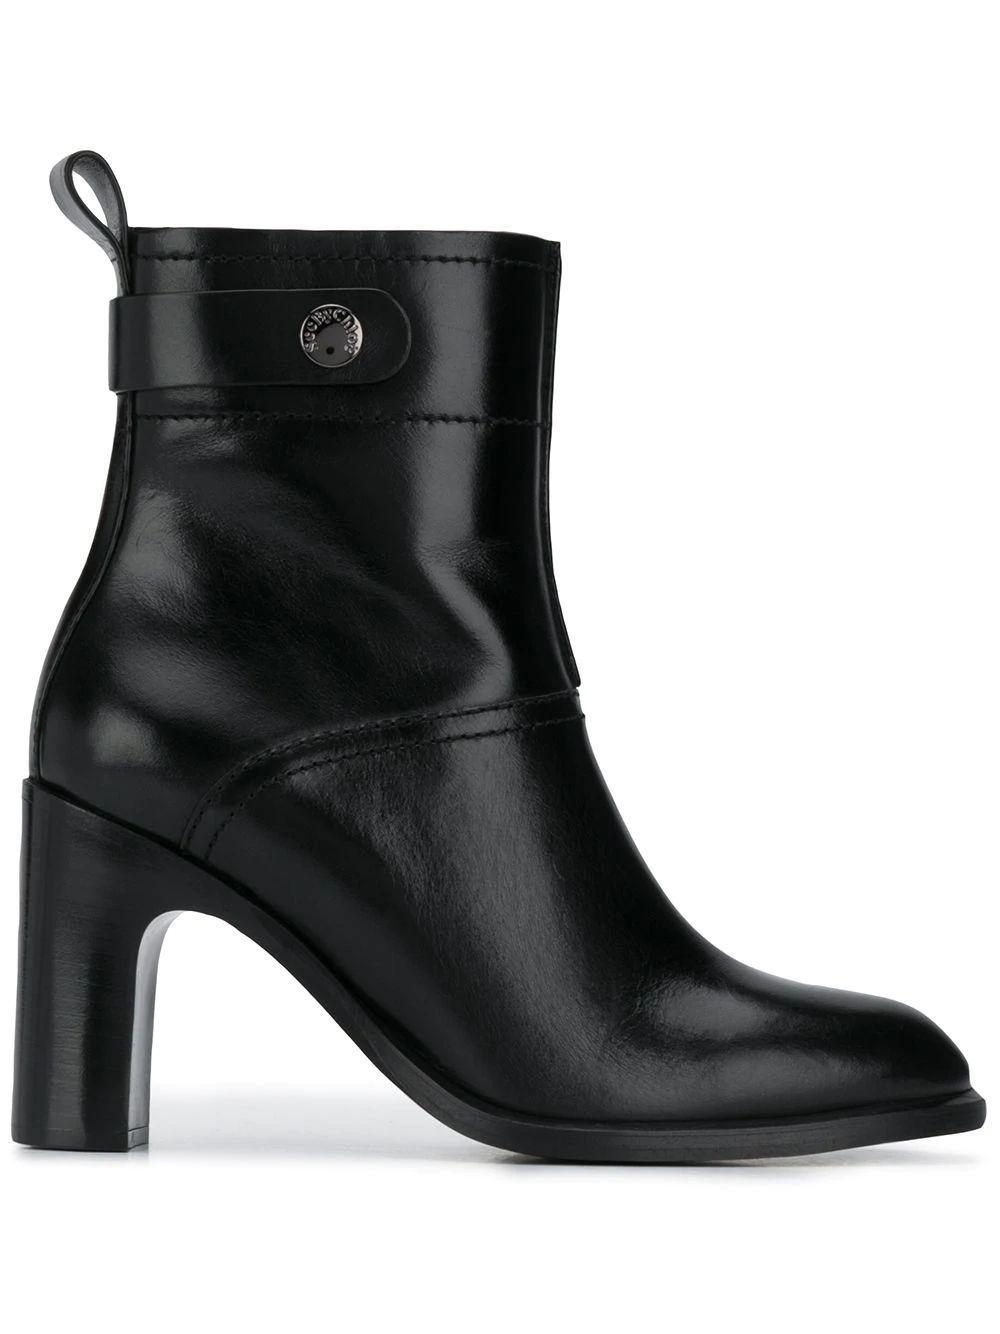 Block Heel Round Toe Bootie Item # SB35004A-C